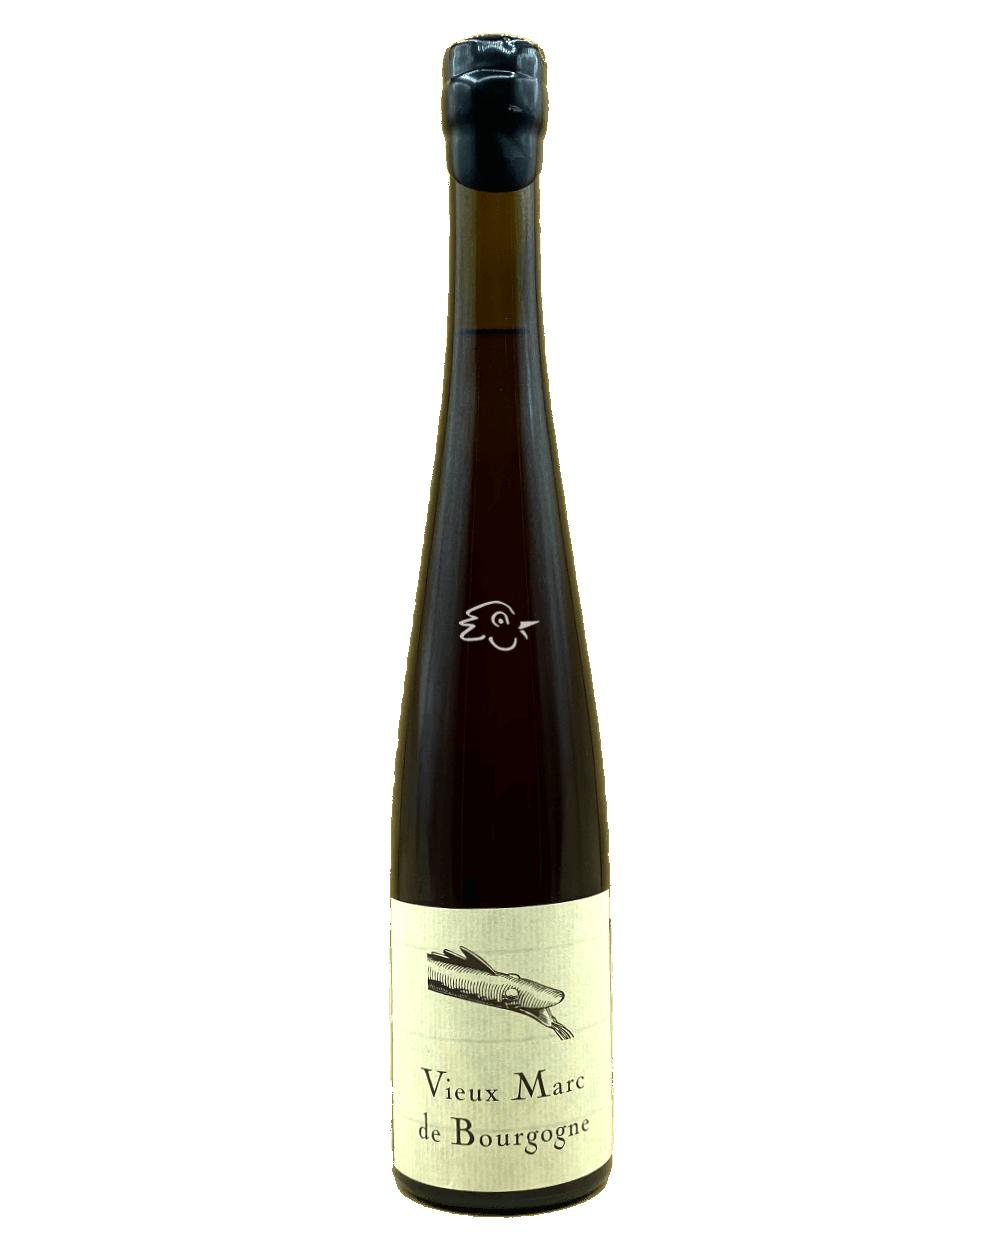 Didier Meuzard - Vieux Marc de Bourgogne - Avintures